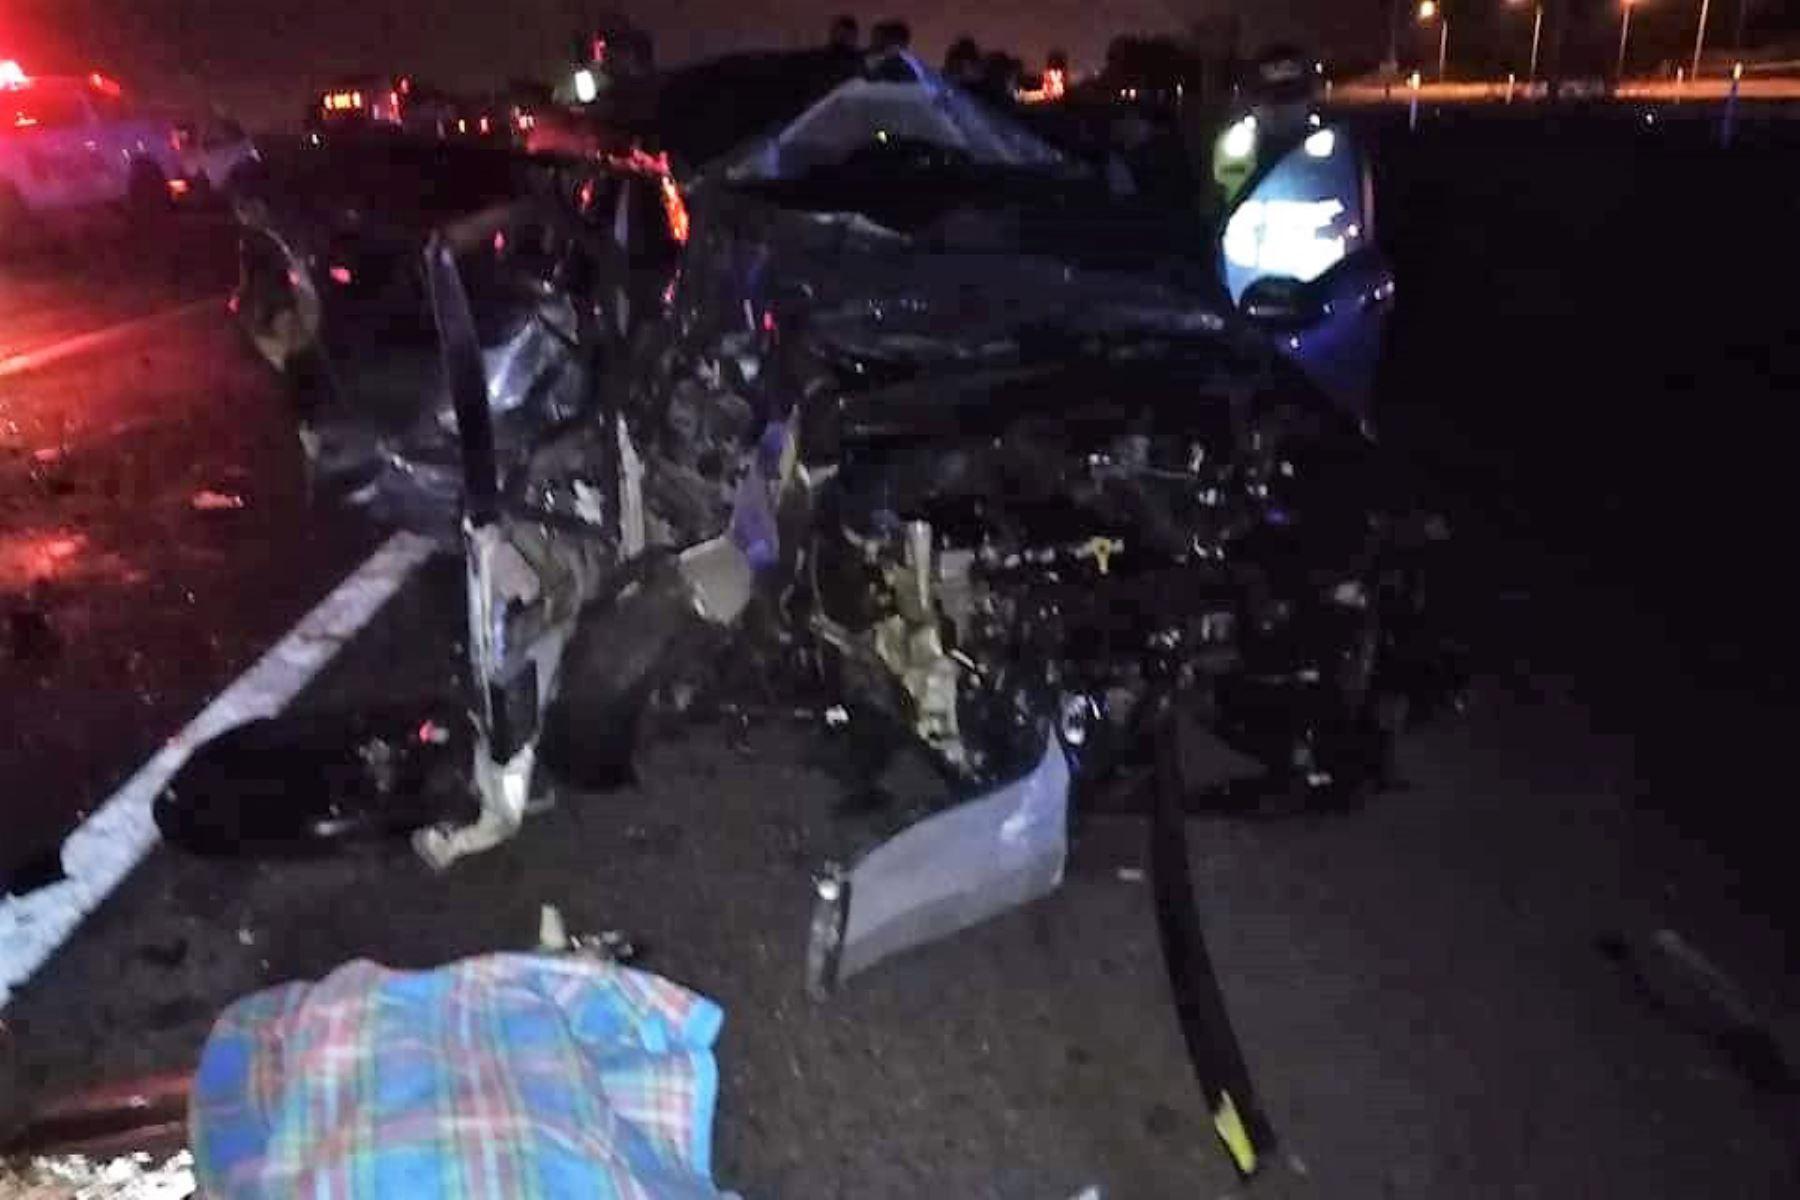 Madre e hijo mueren en fatal accidente a la altura de bulevar de Asia. Foto: Prensa Maleña